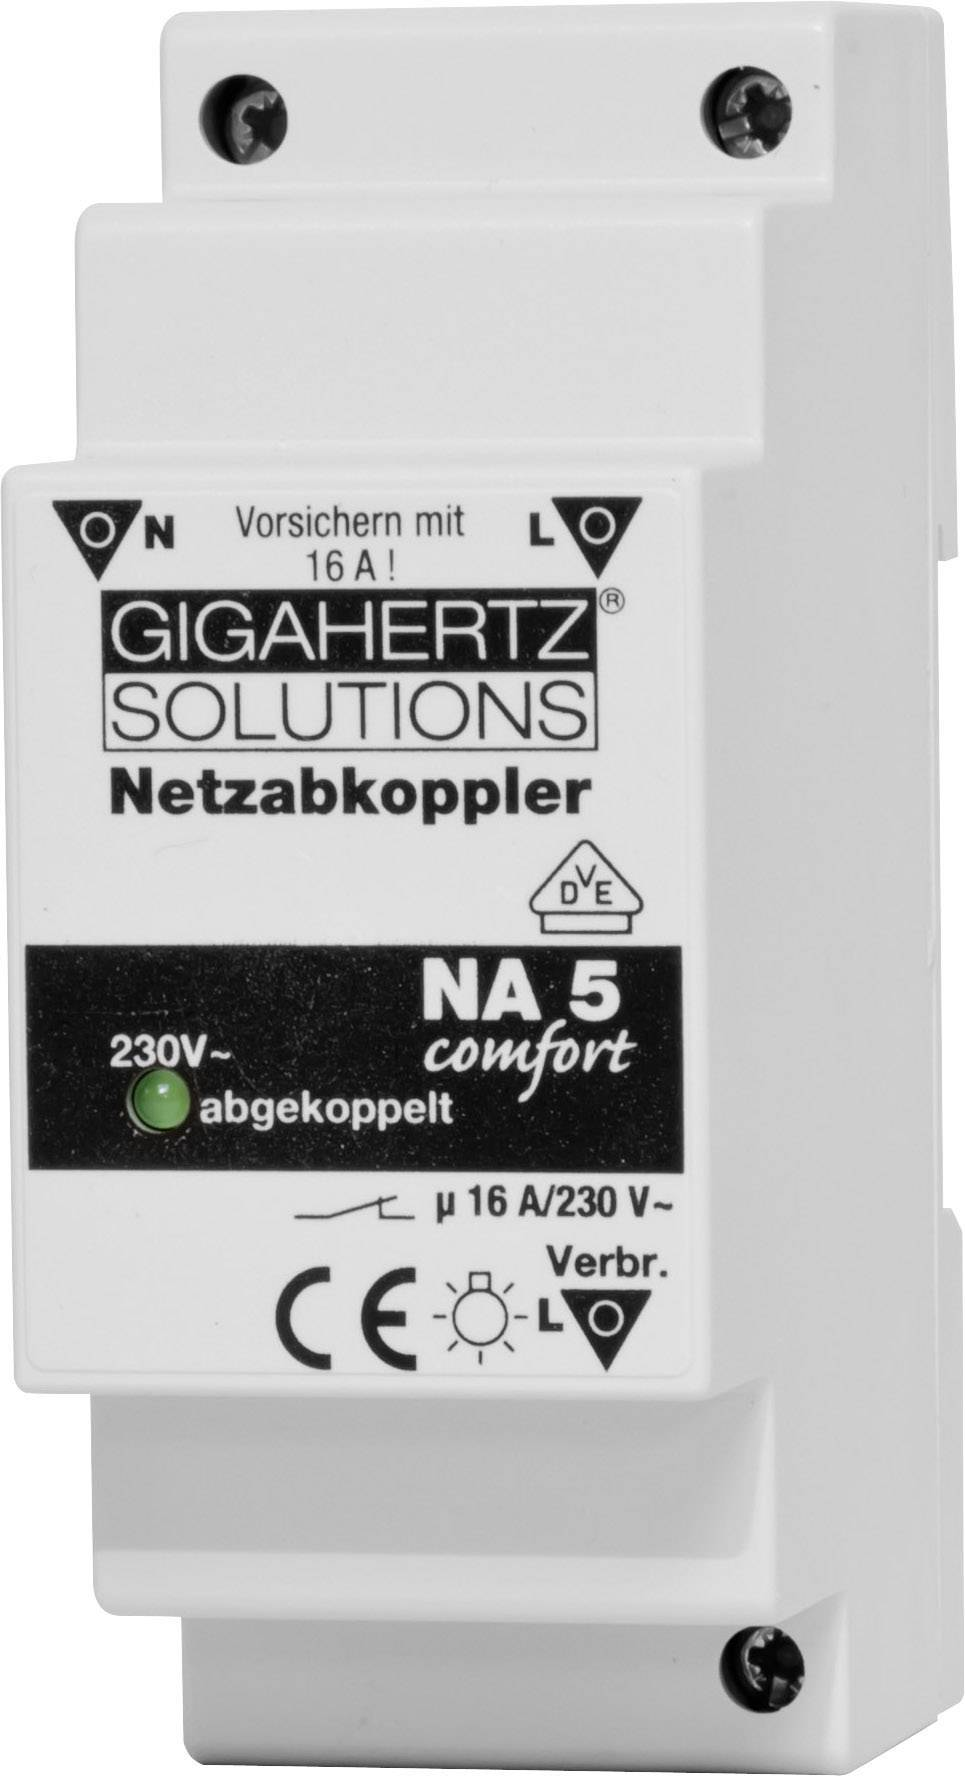 Schalk Netzfreischalter NFA 61 230V Netzfeld Abschaltautomat